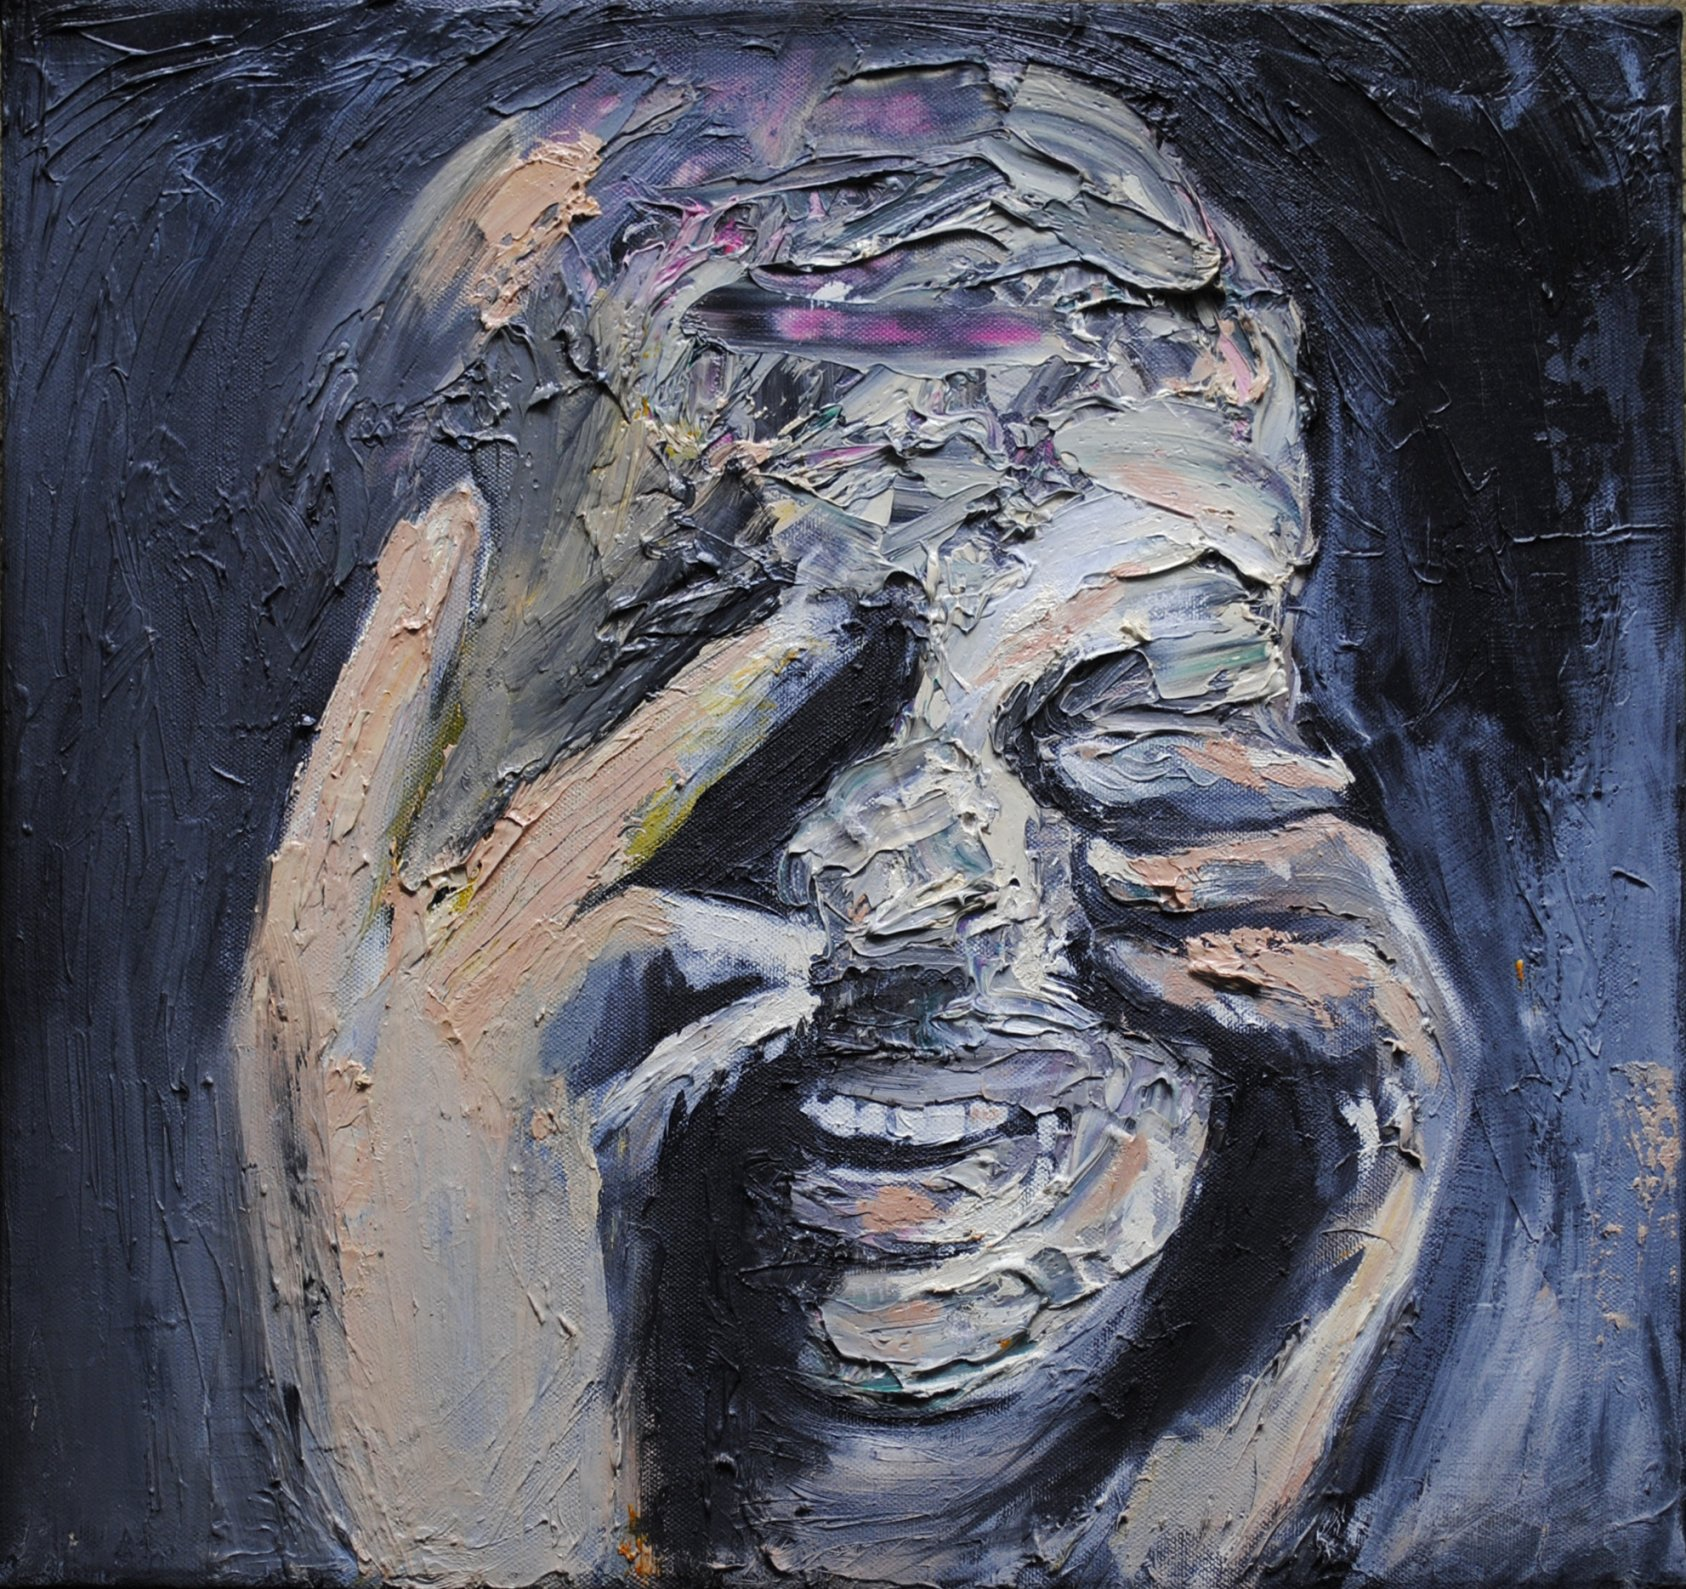 Sin titulo (2014) - Jose Castillo Picado